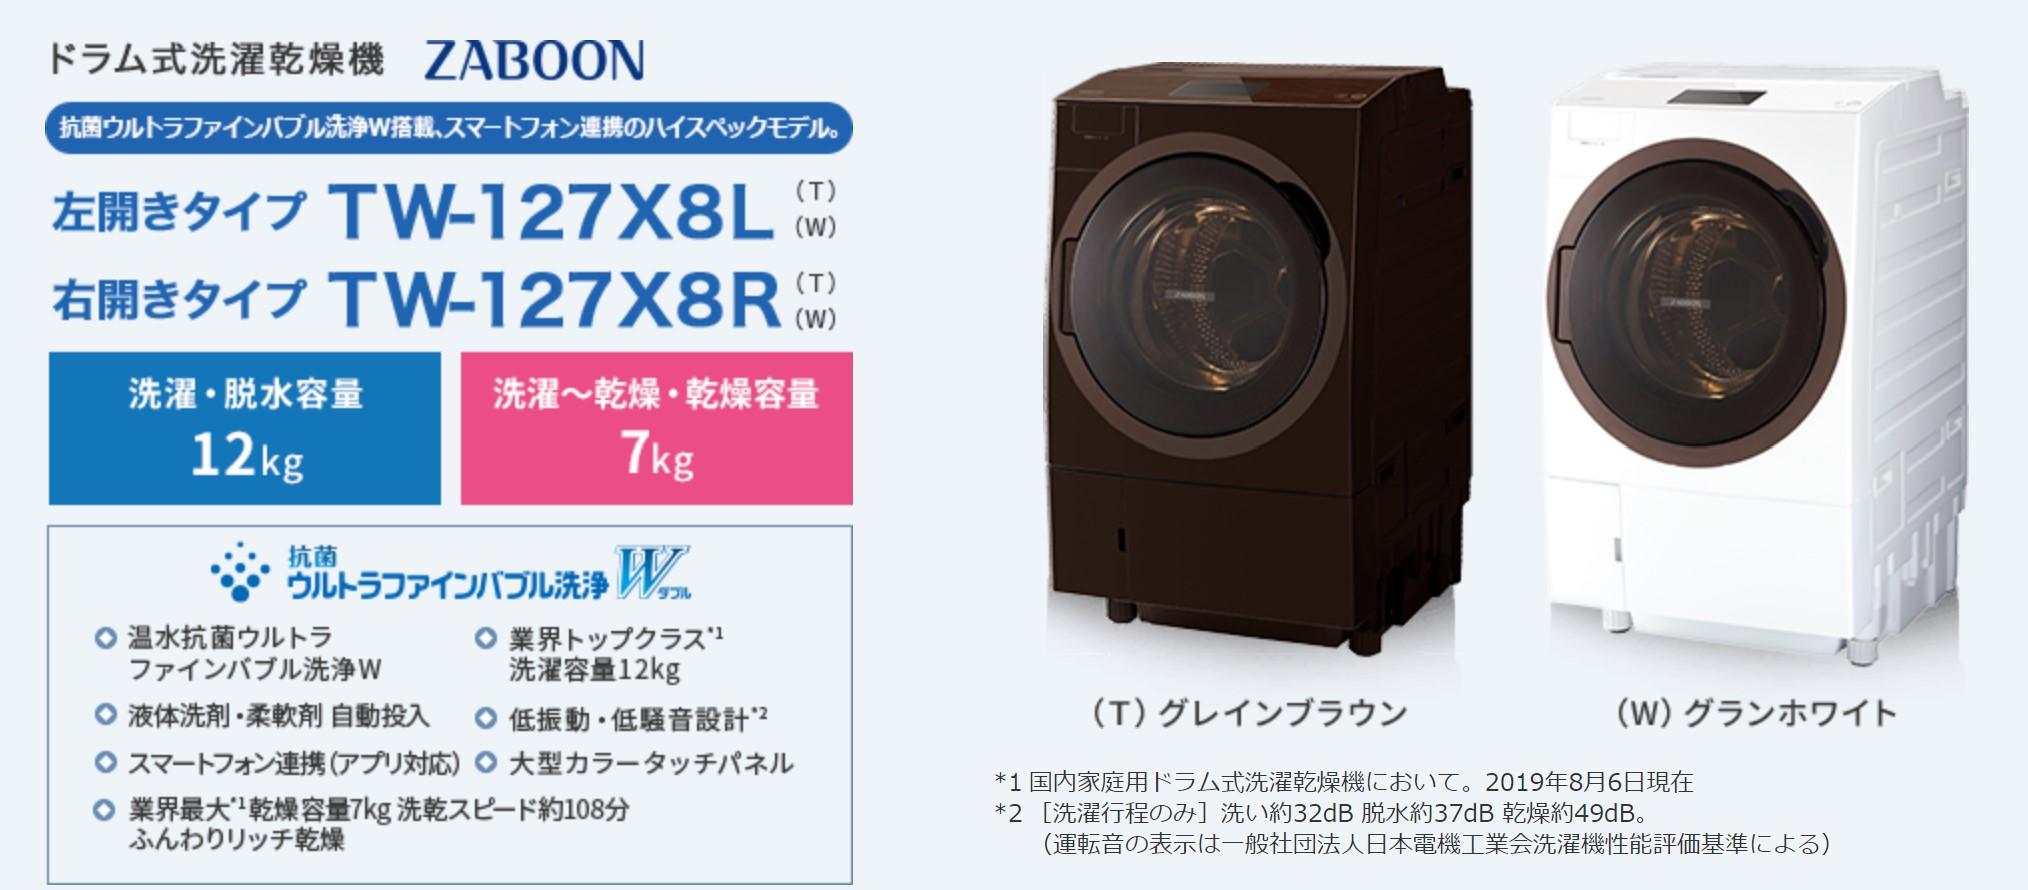 TOSHIBA TW-127X8Lの最大洗濯容量・最大乾燥容量